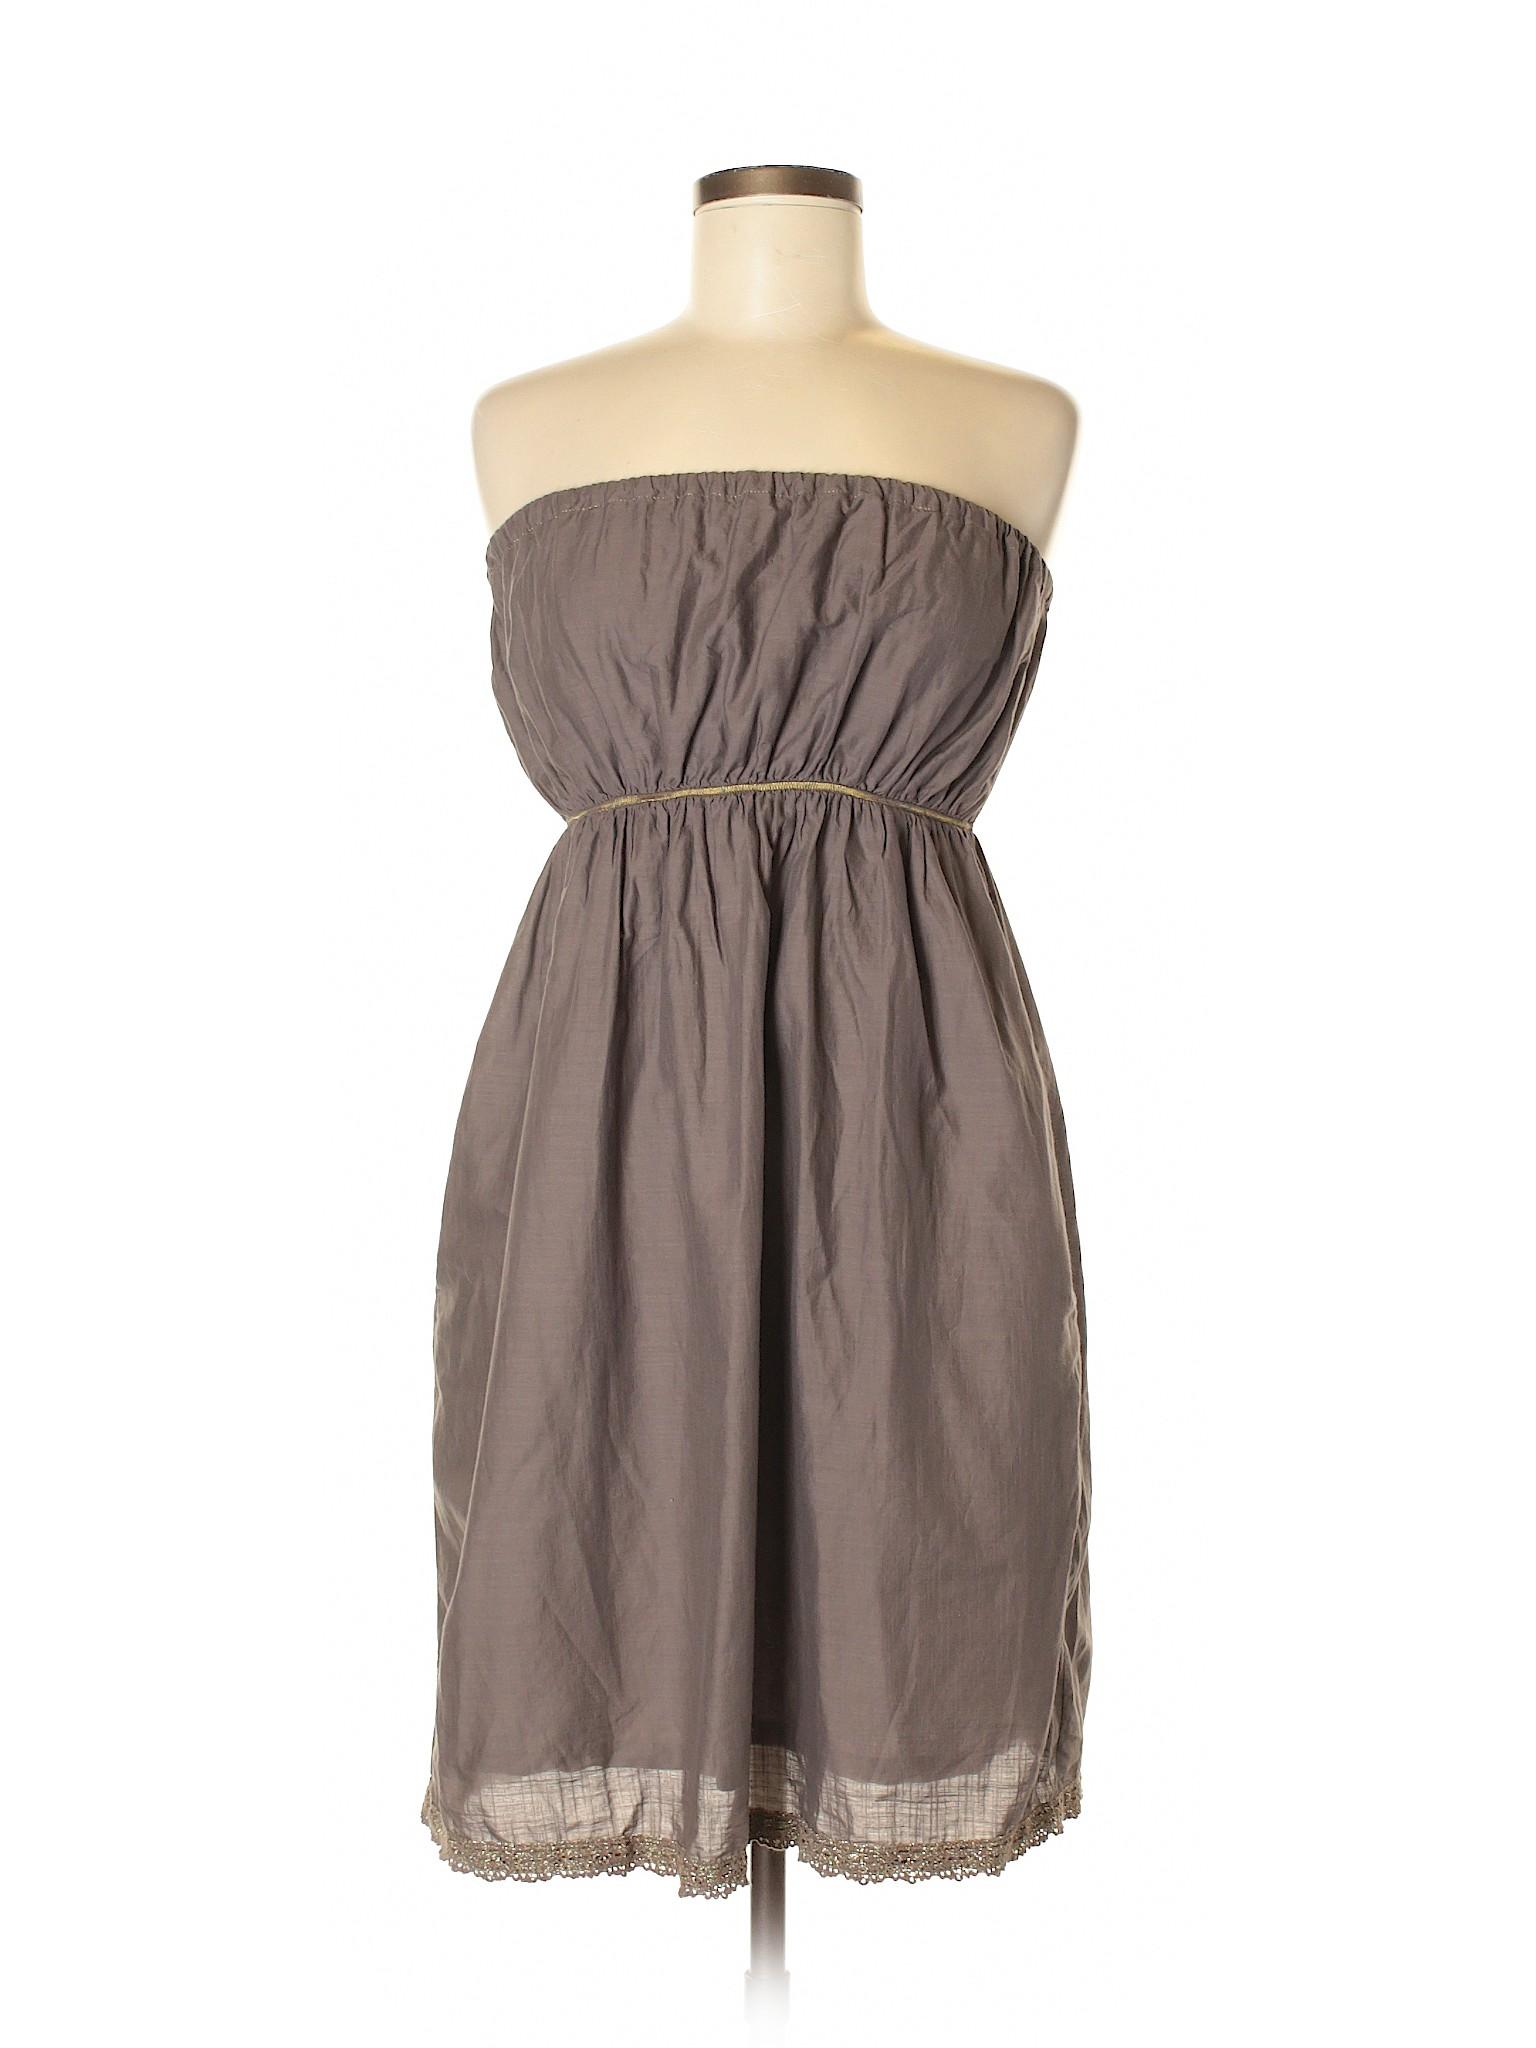 winter Dress Boutique Fei Casual winter Casual Boutique Fei qzIzv